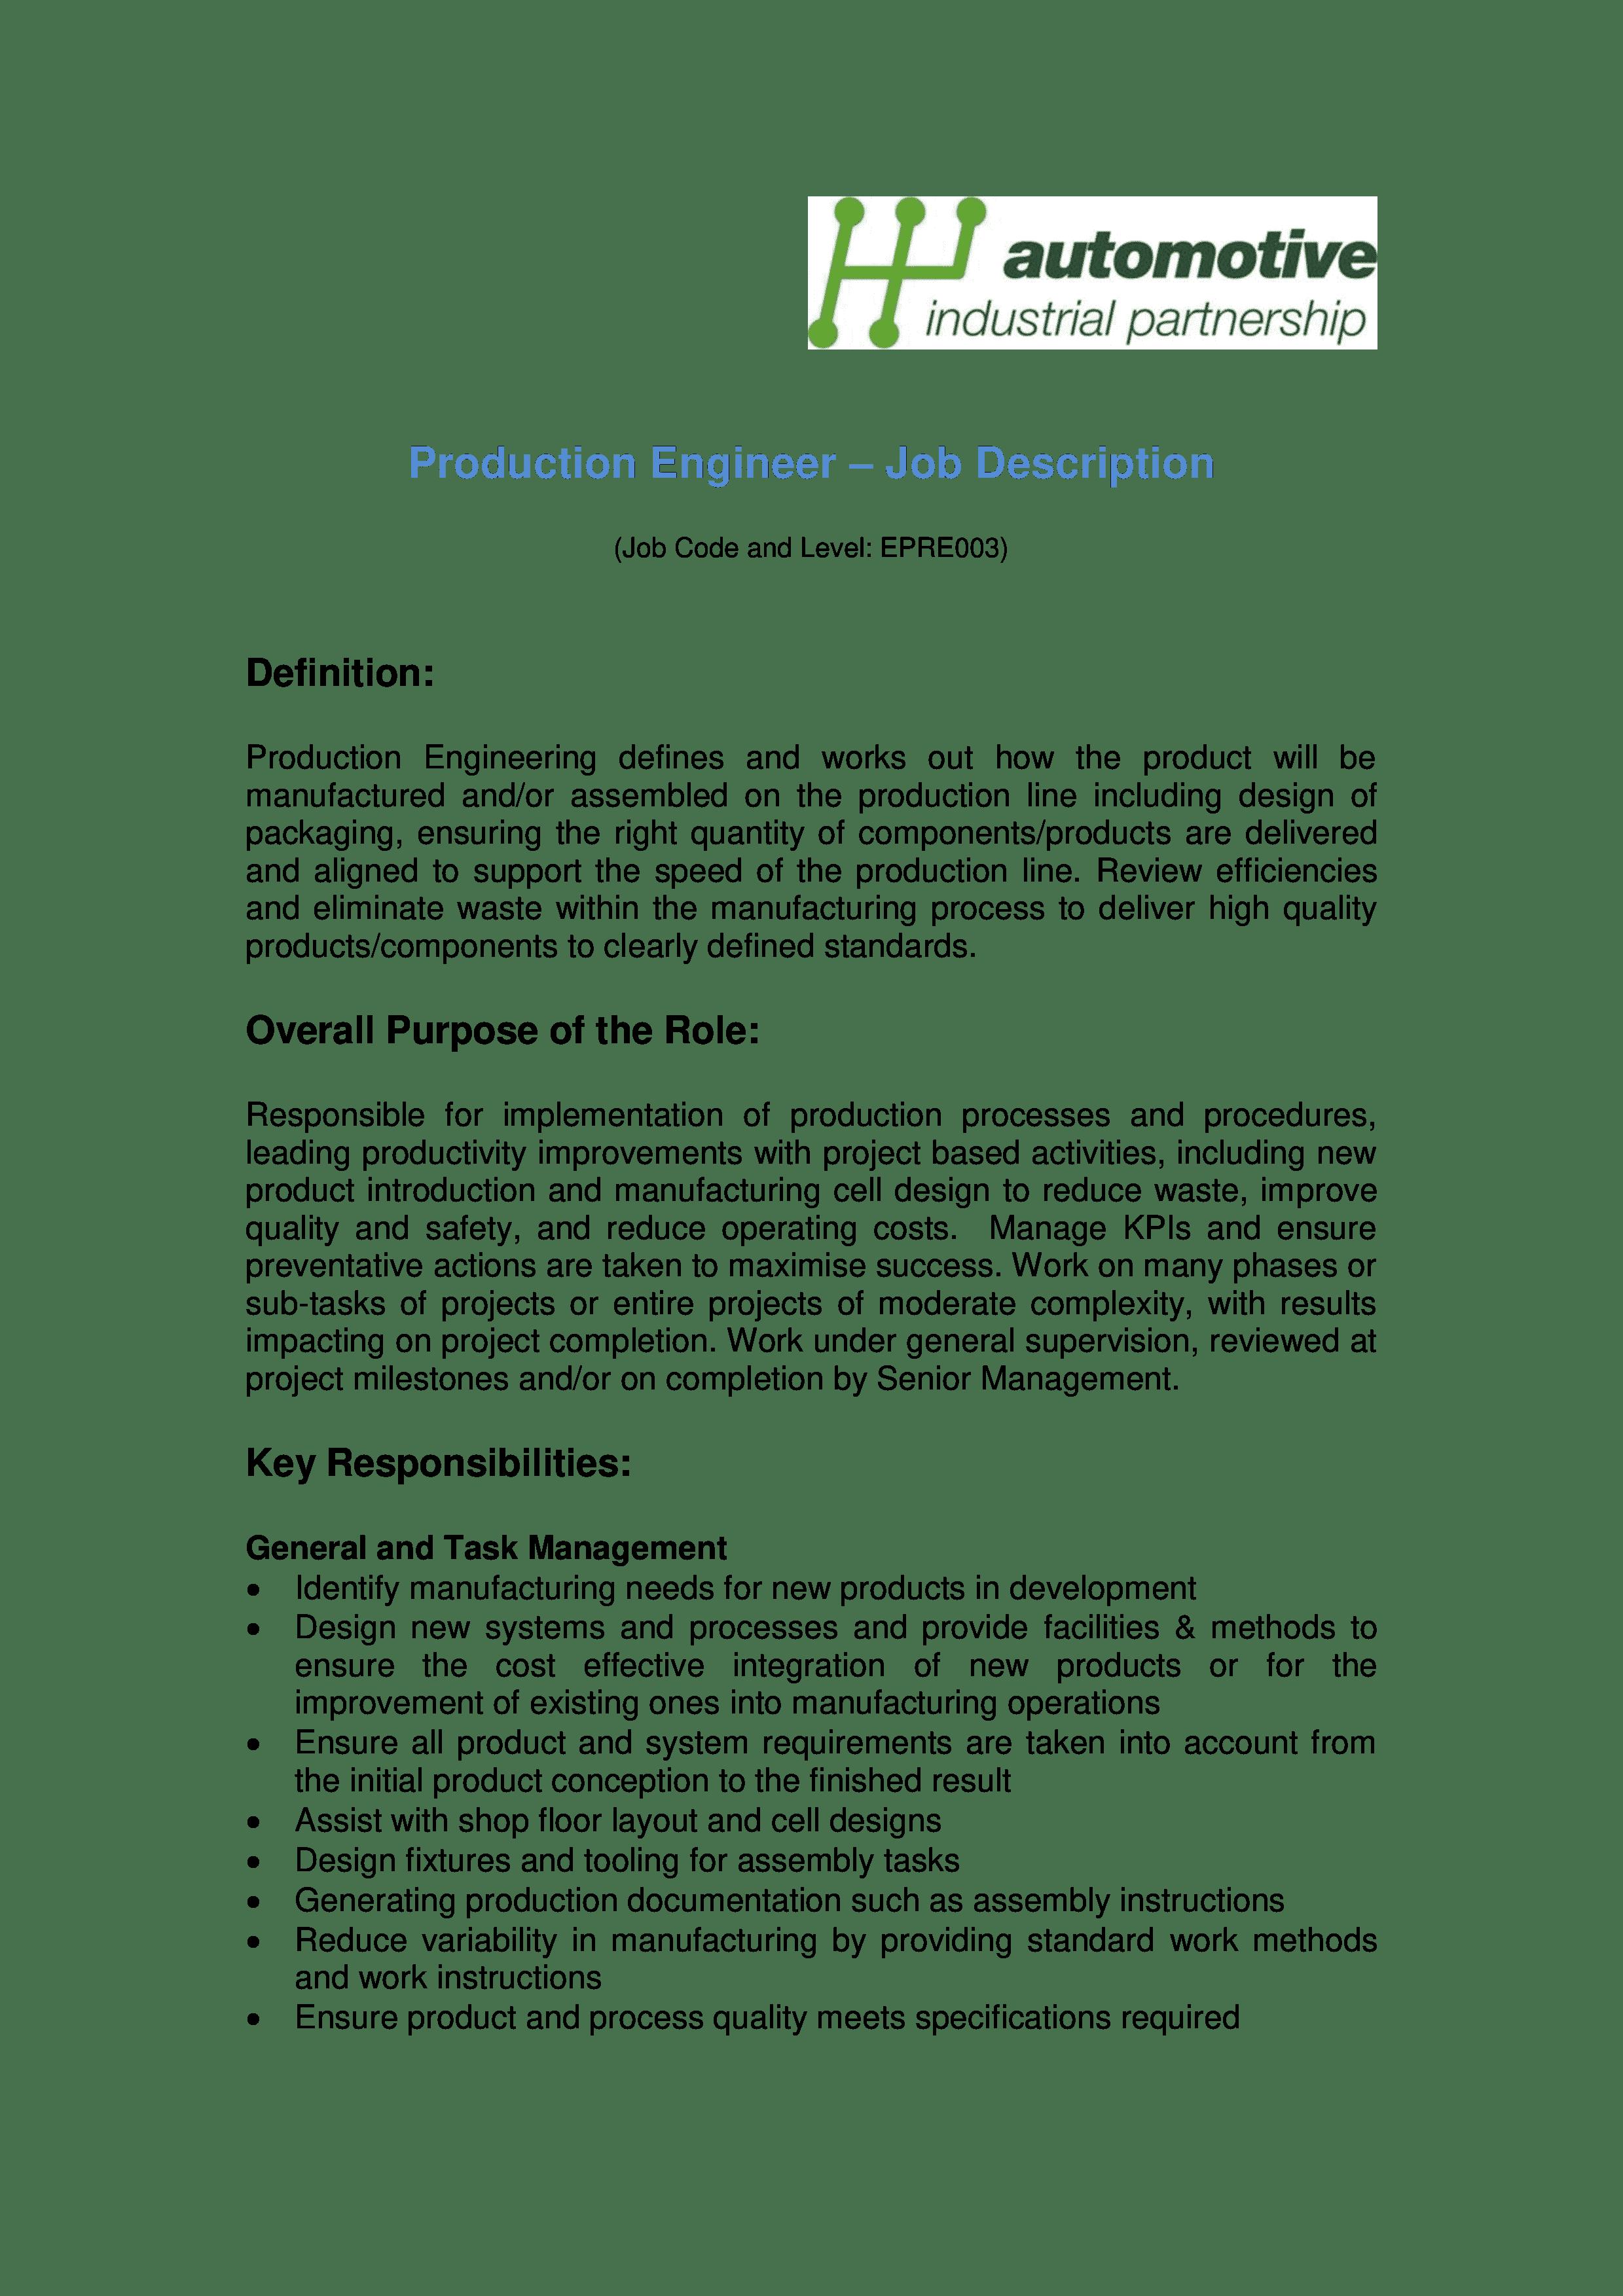 production-engineer-job-responsibilities